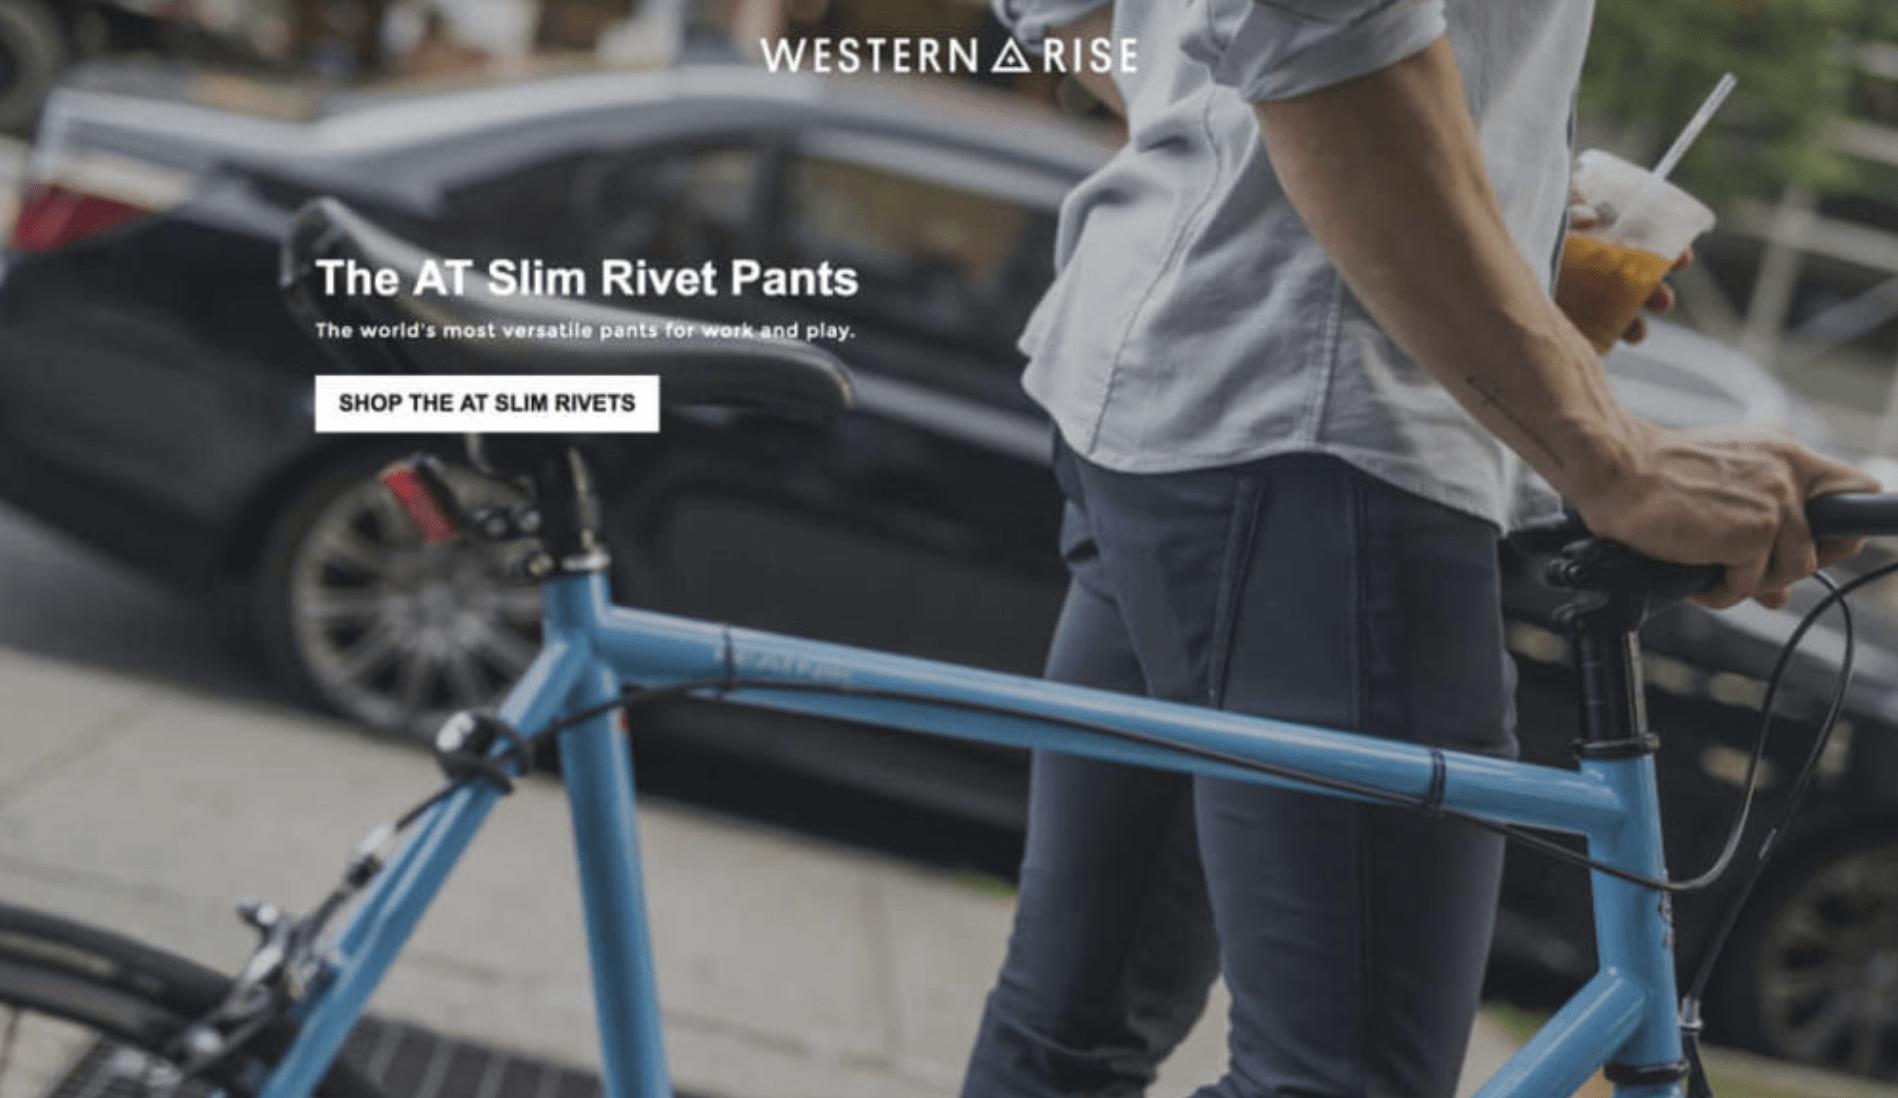 Landing Page Headlines - Western Rise